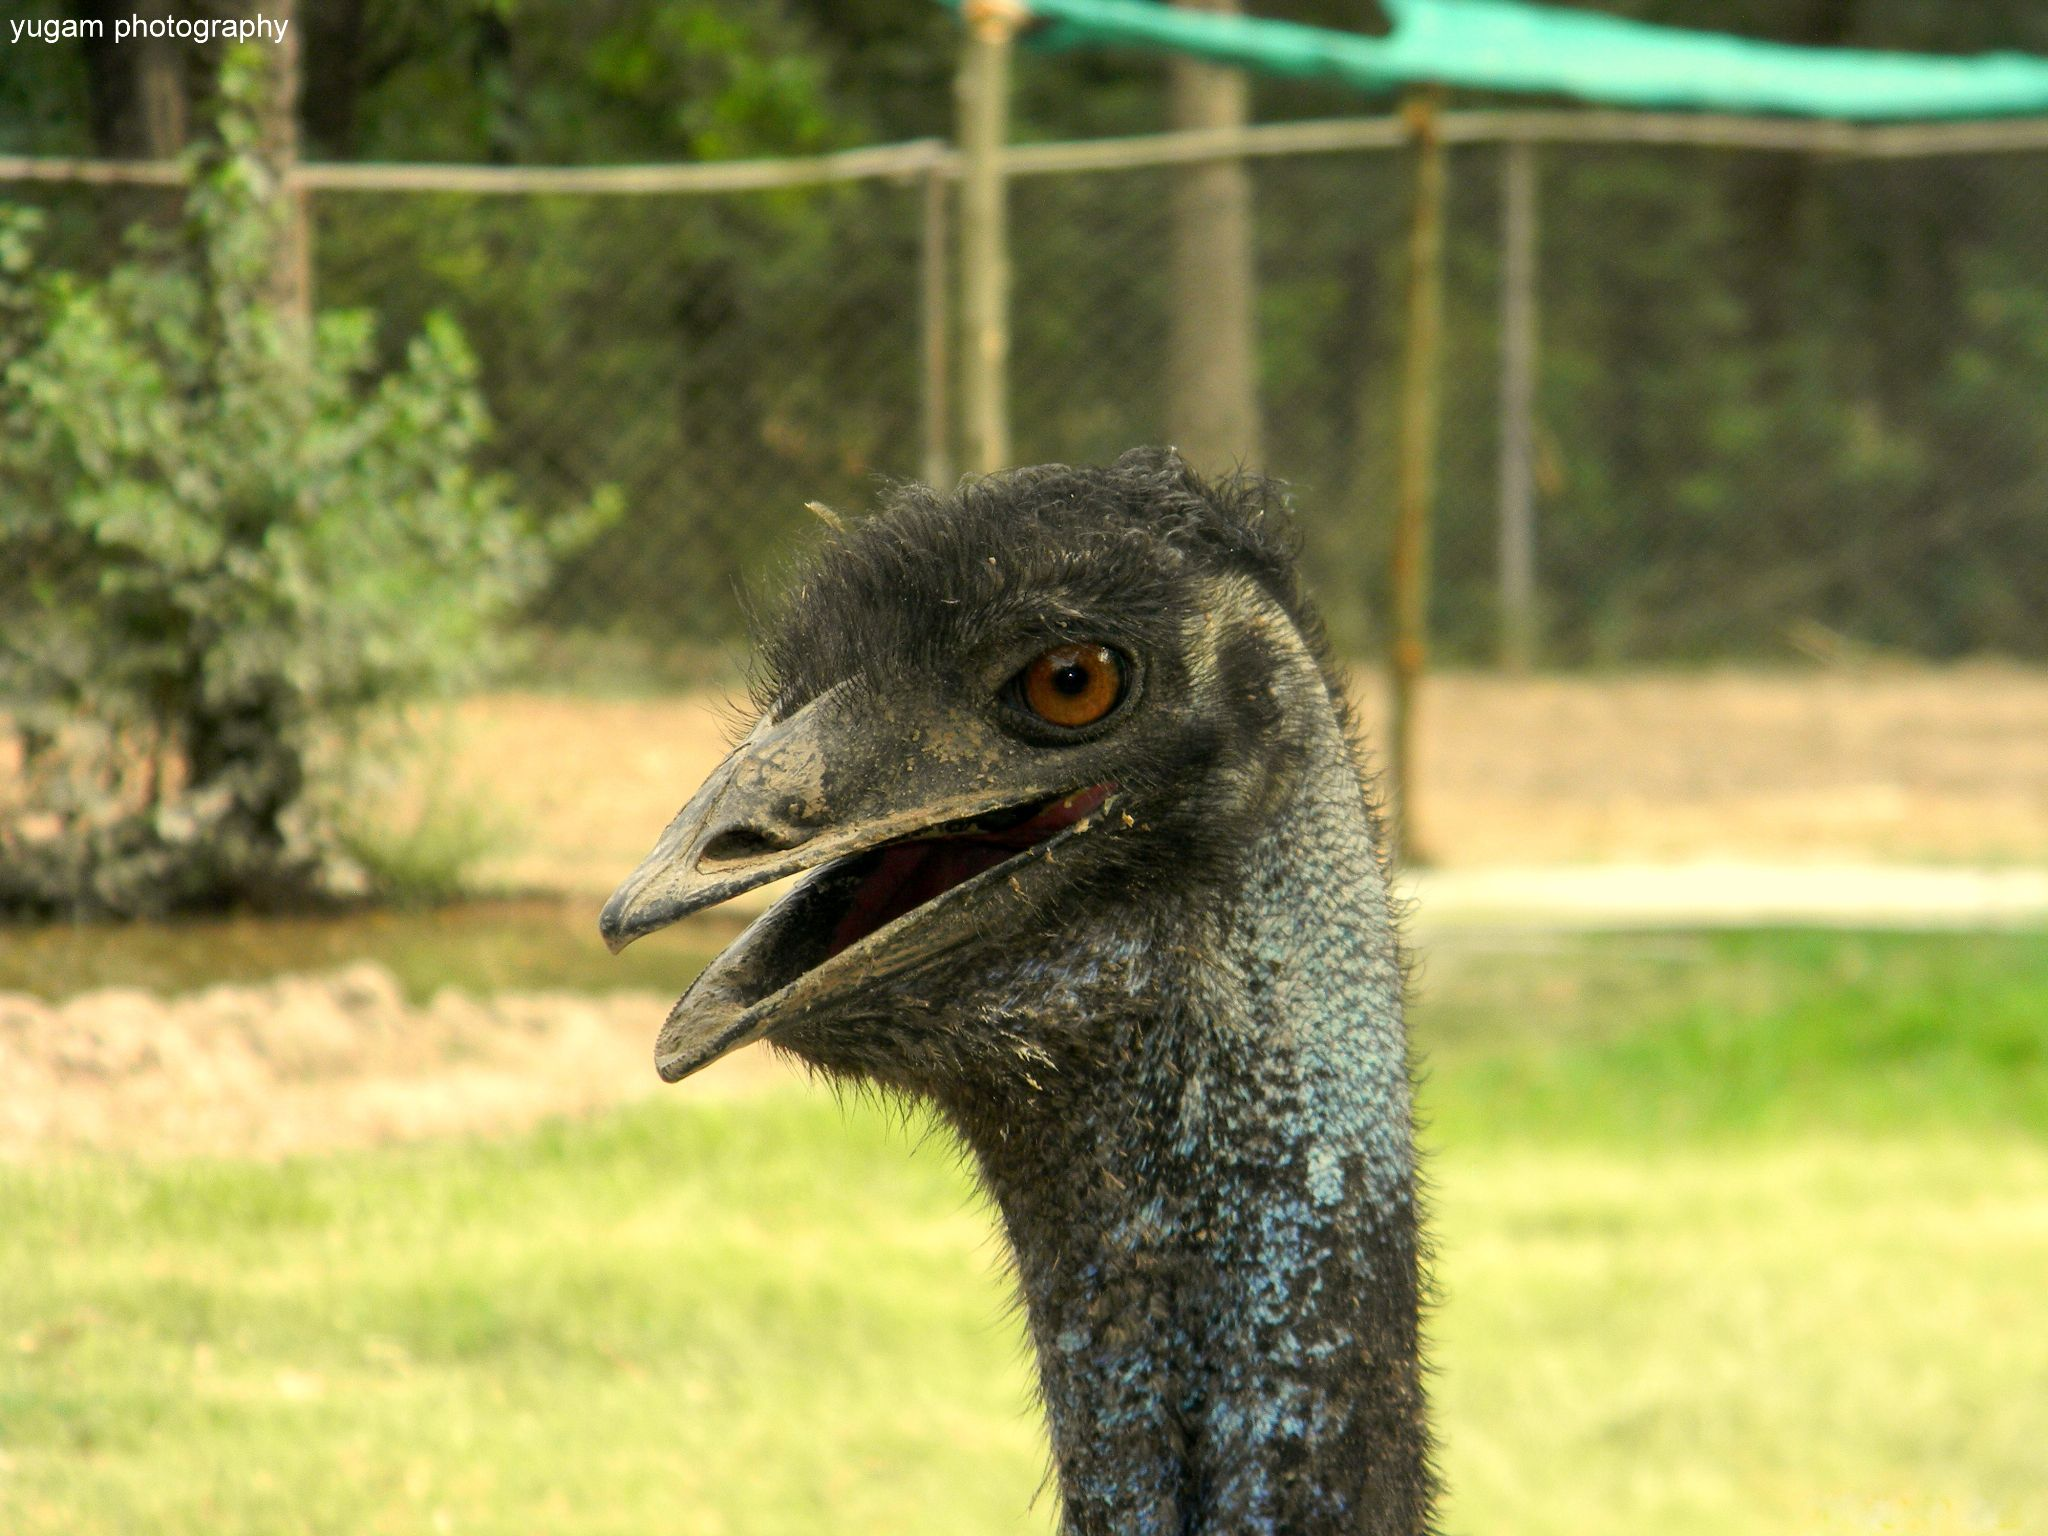 ostrich by Yugam Kaka